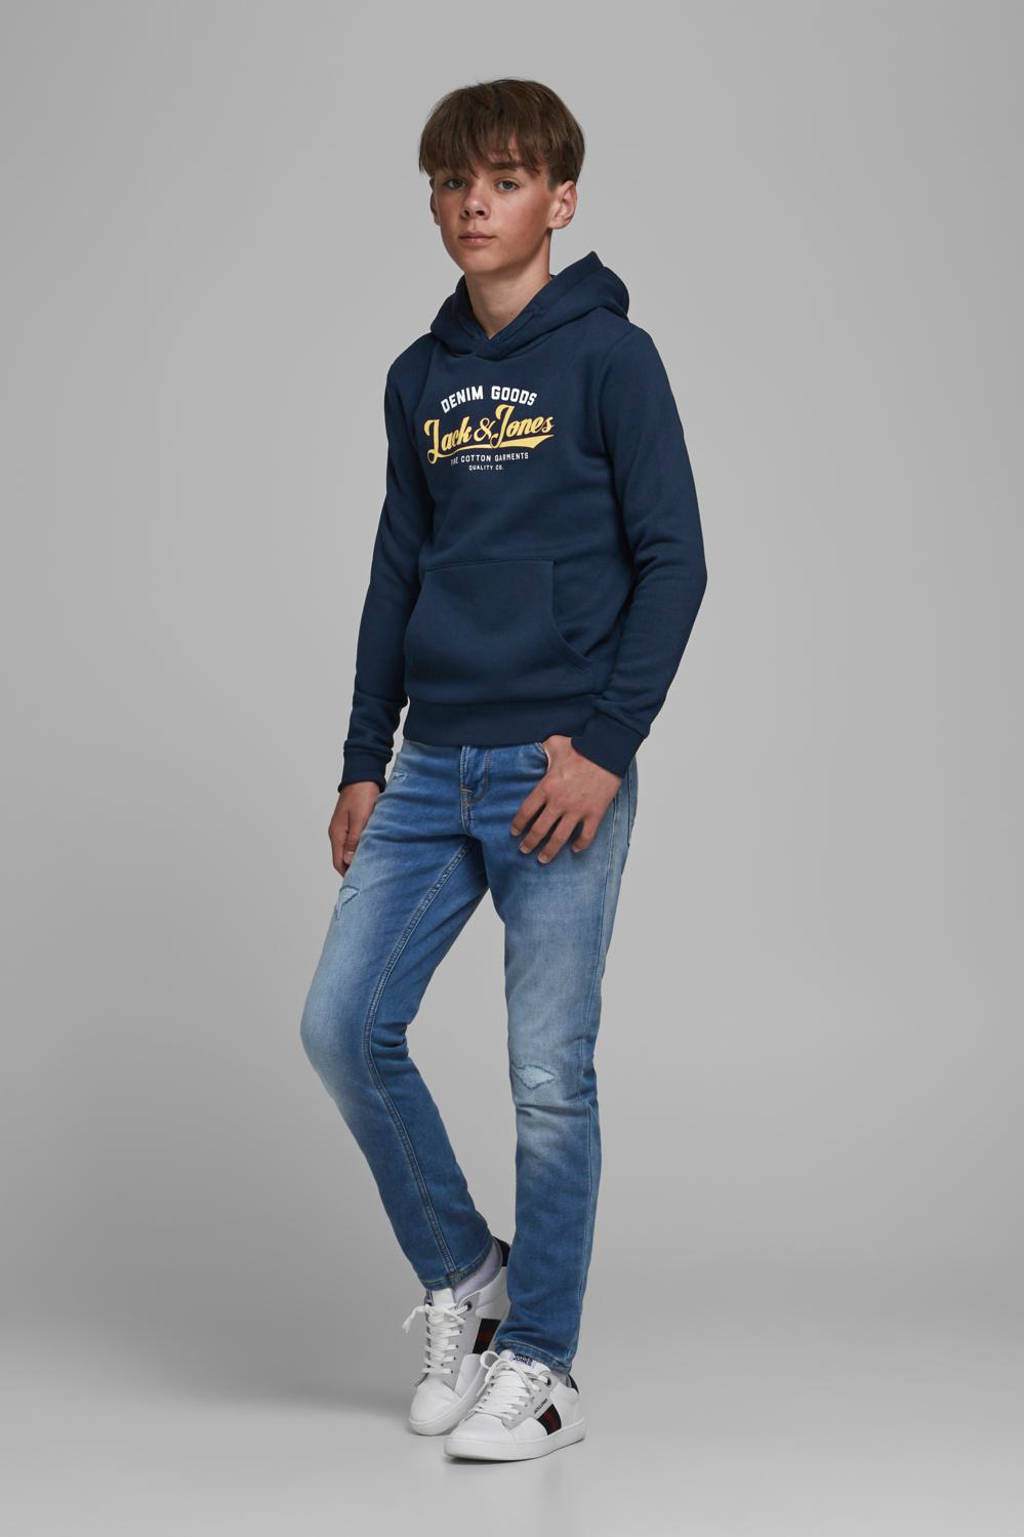 JACK & JONES JUNIOR hoodie met logo donkerblauw/geel/wit, Donkerblauw/geel/wit